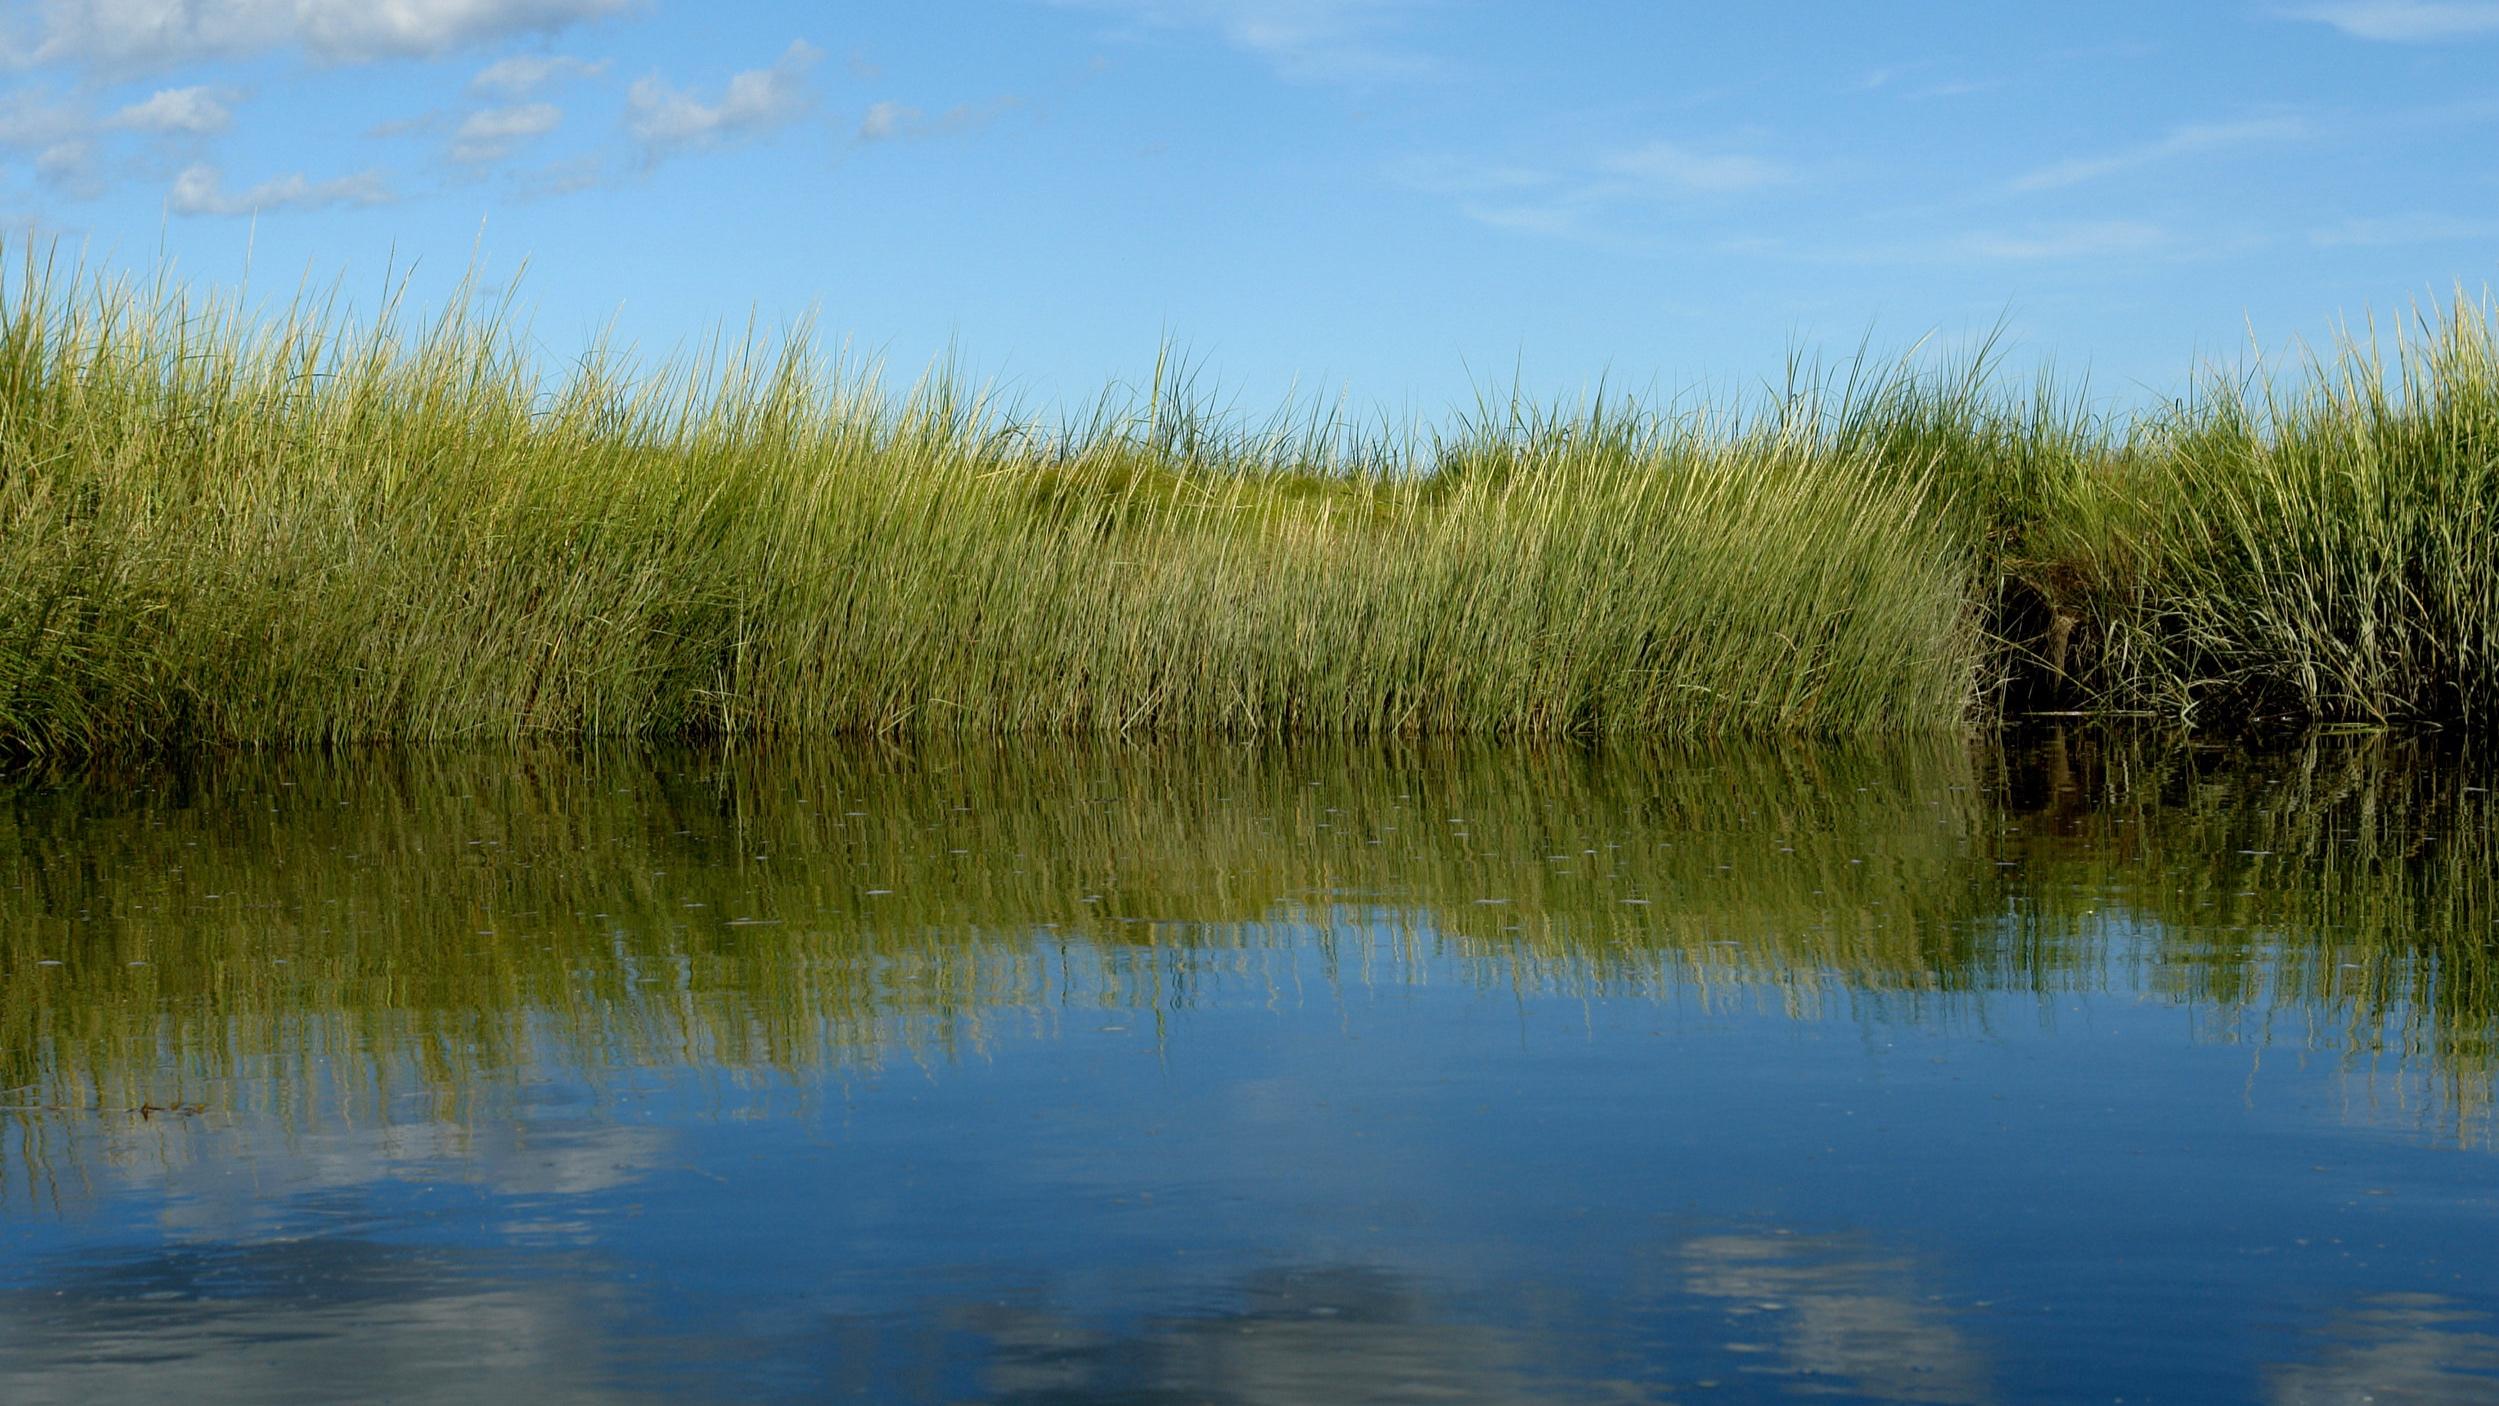 marsh_grass.jpg